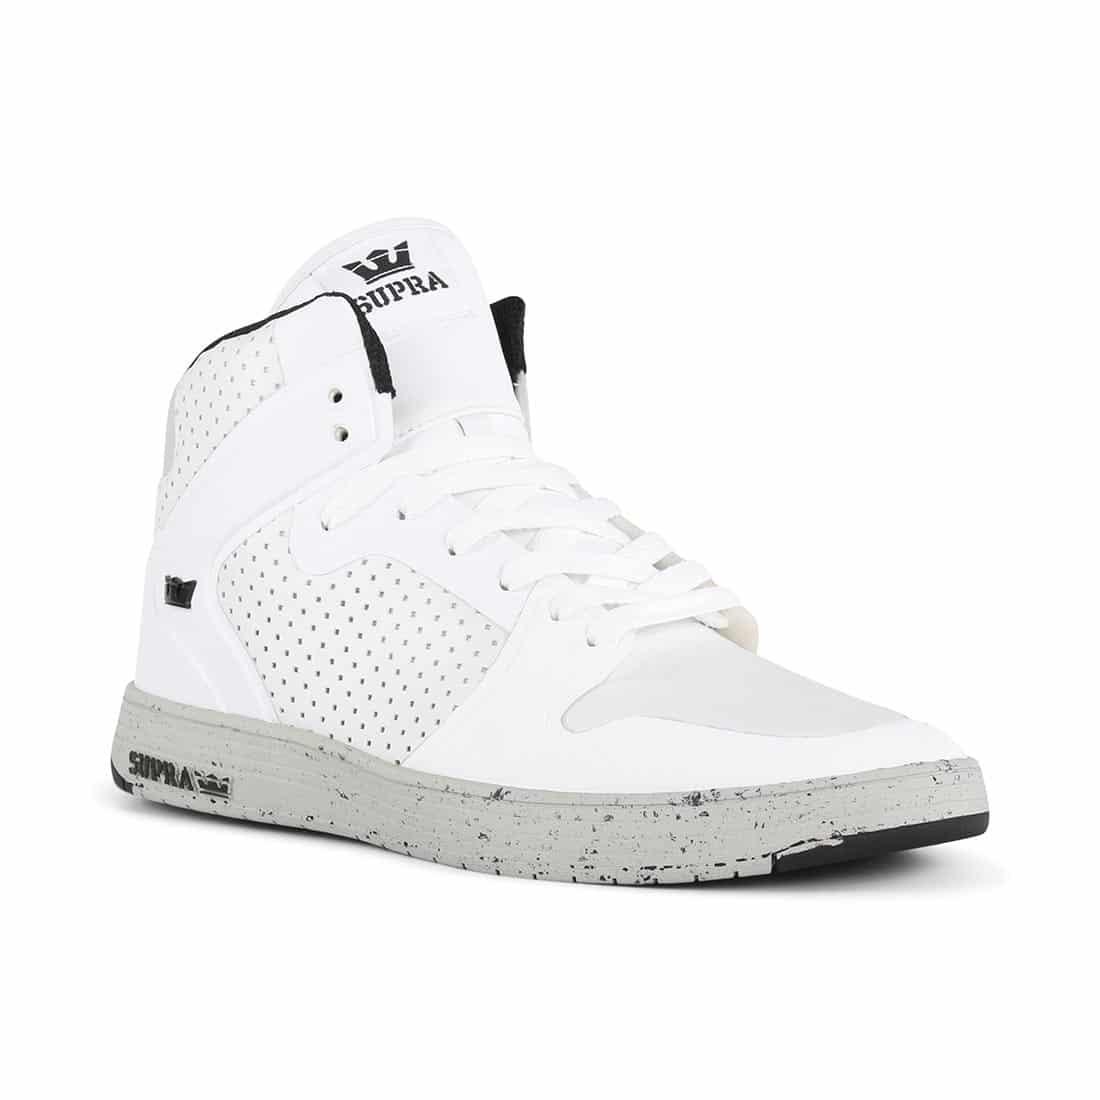 Supra Vaider 2.0 LX Shoes - White / Light Grey / Light Grey